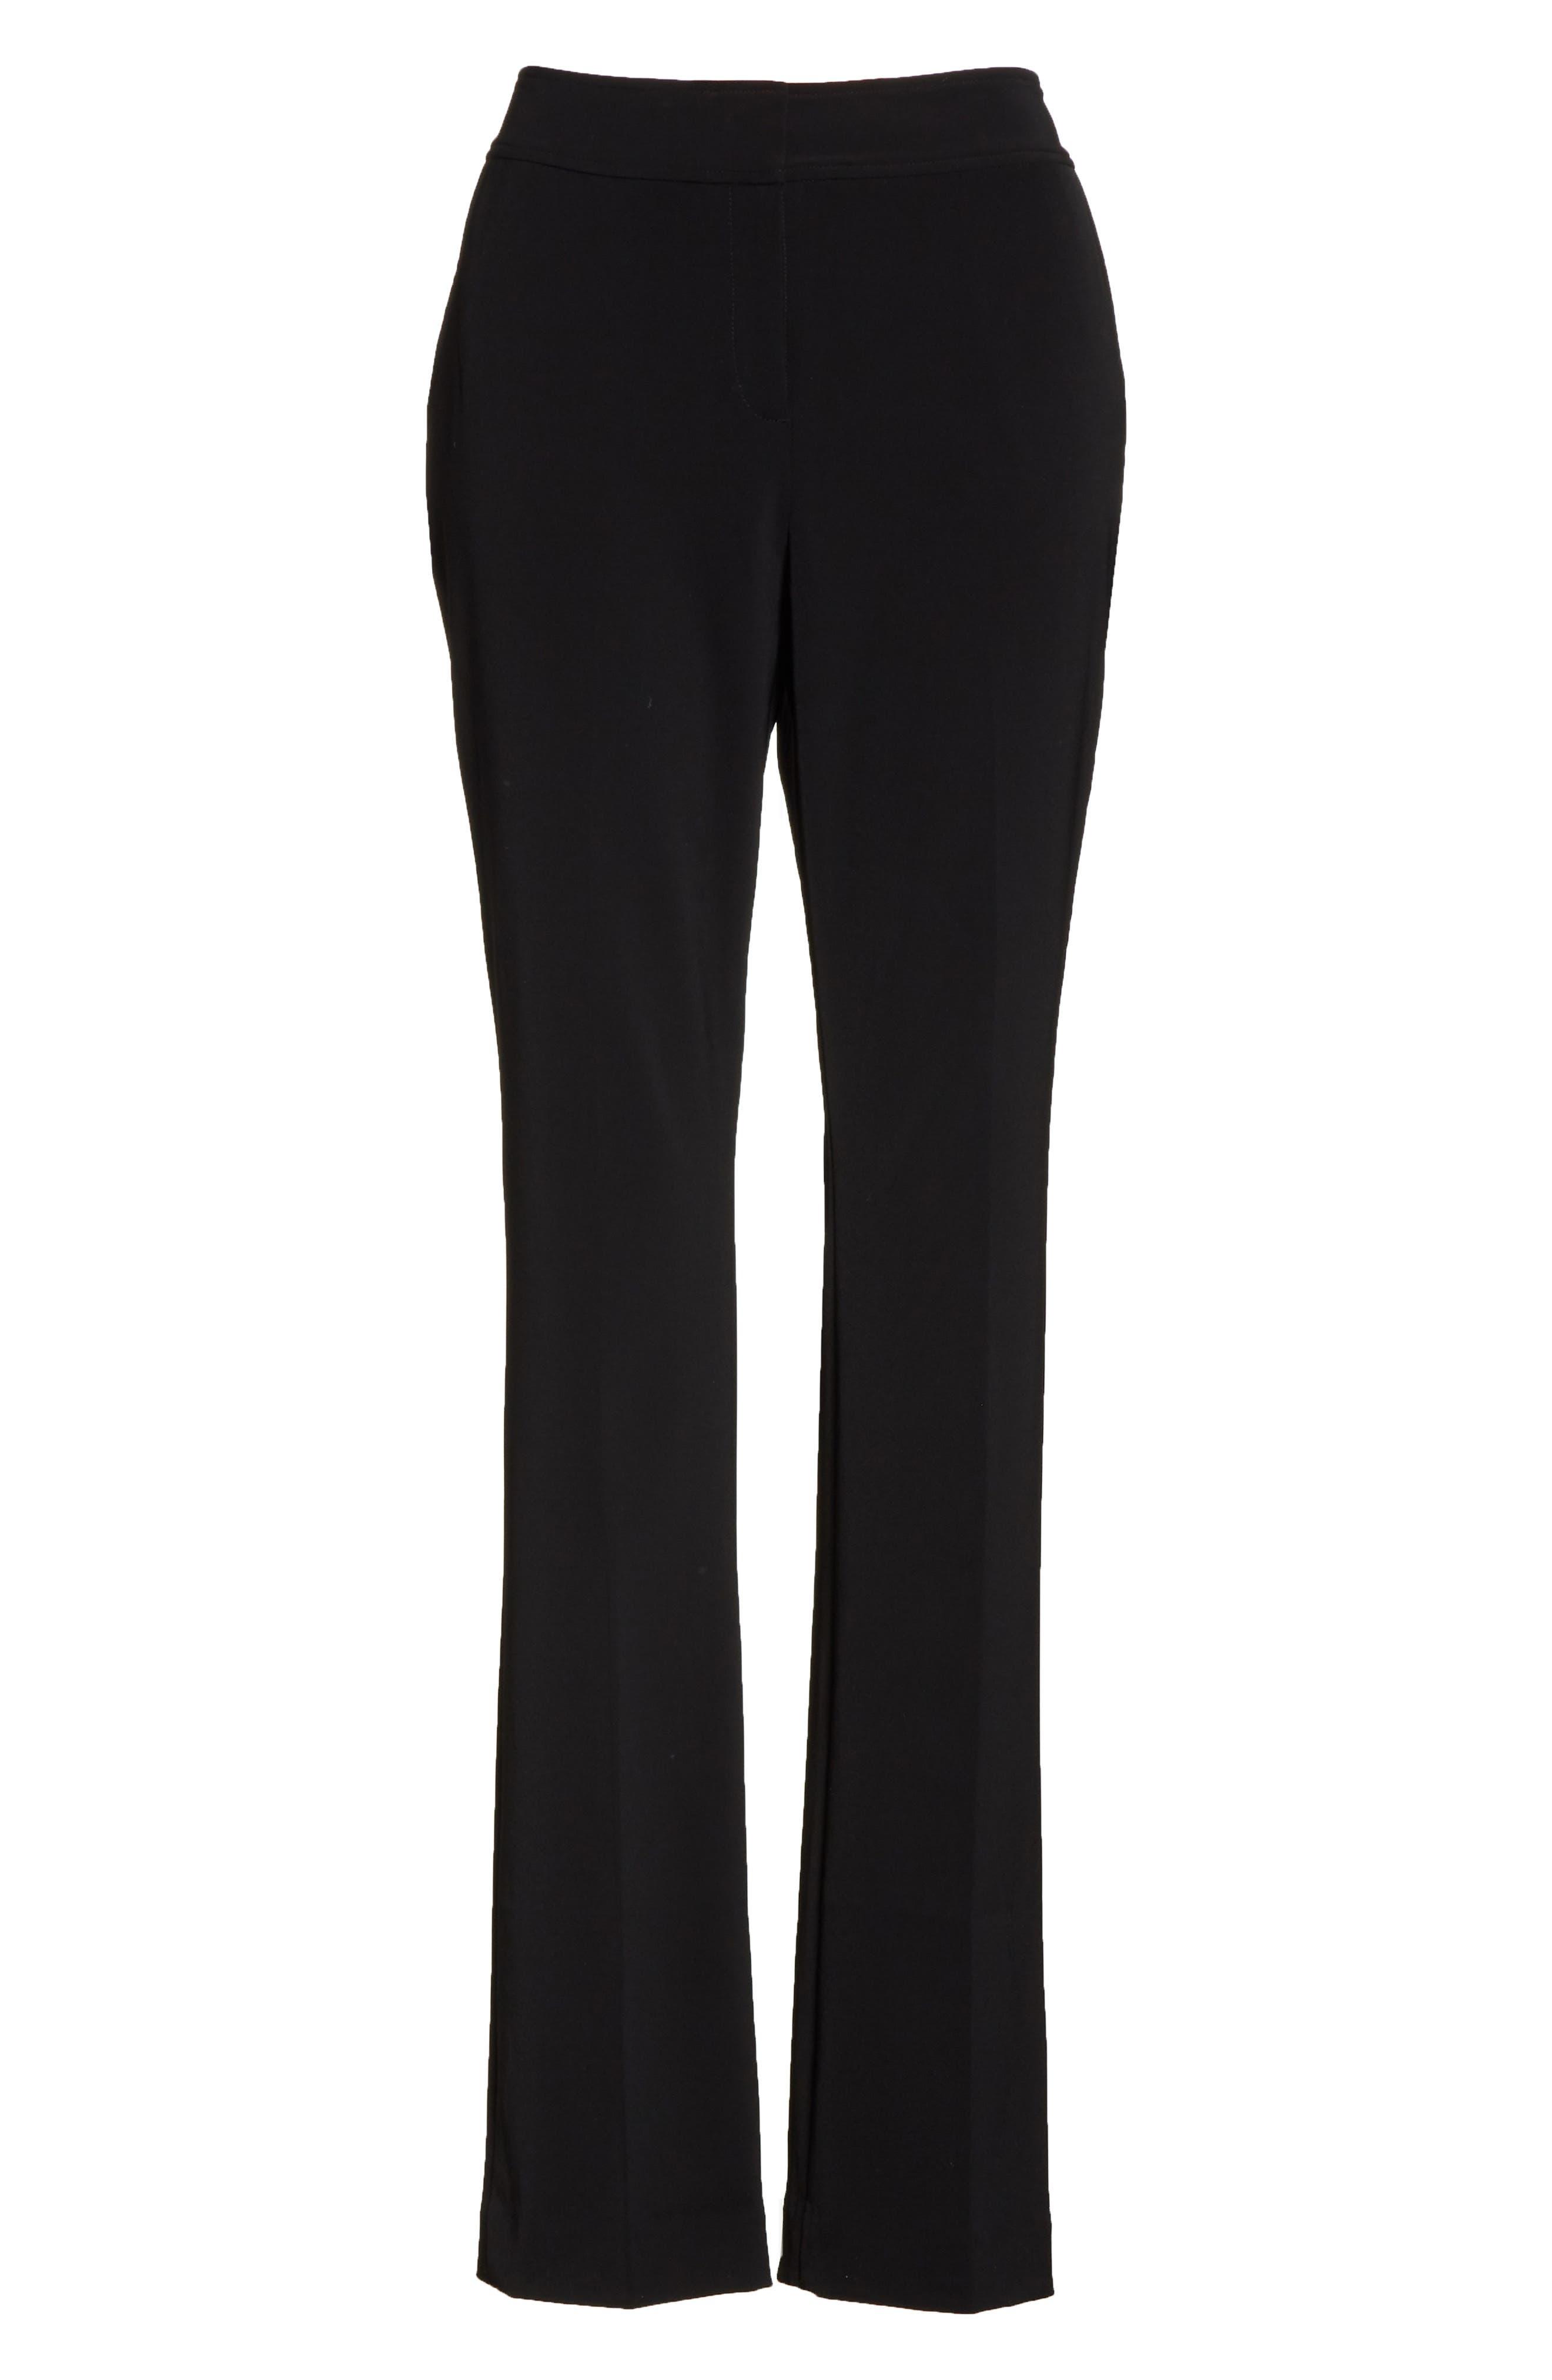 Yulit High Waist Trousers,                             Alternate thumbnail 6, color,                             001